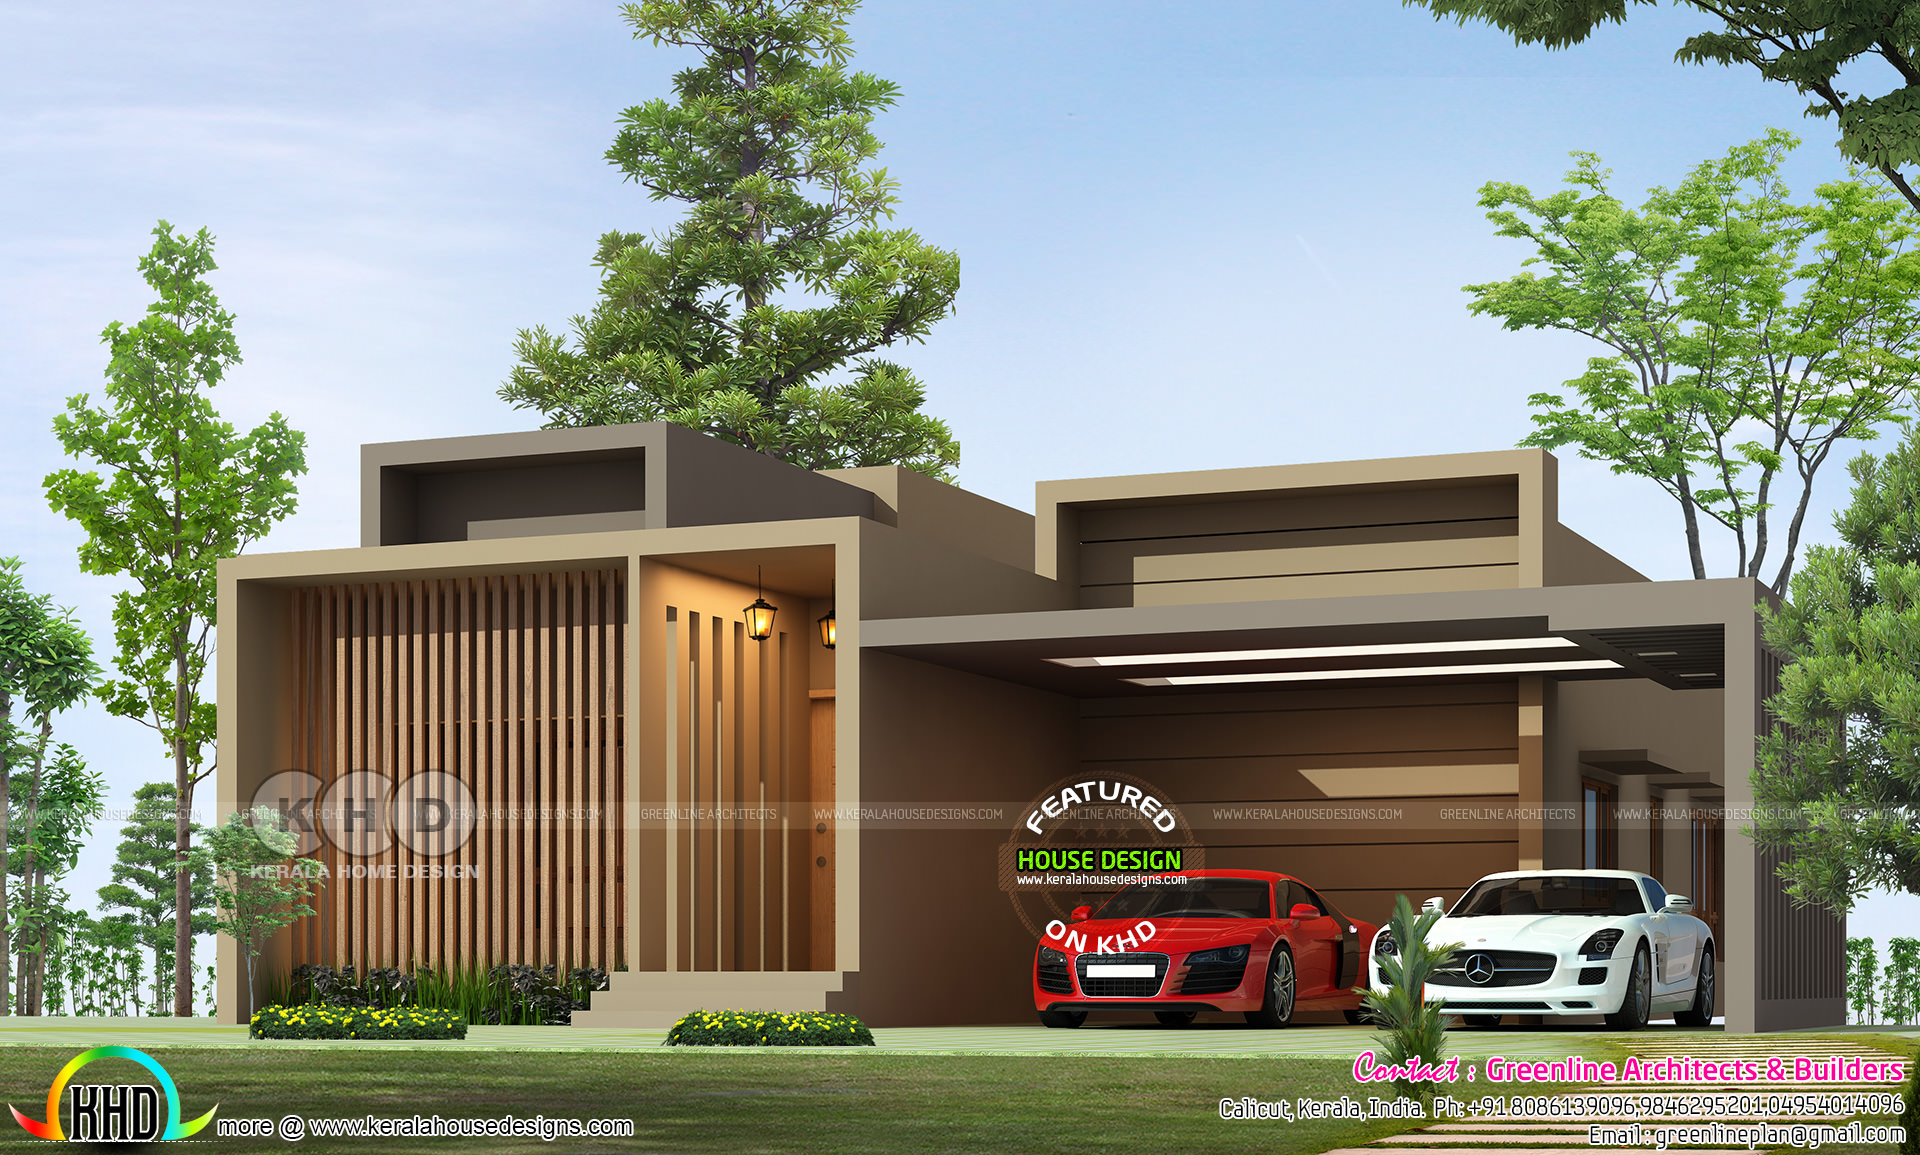 Box model single floor ultra modern home plan - Kerala ...